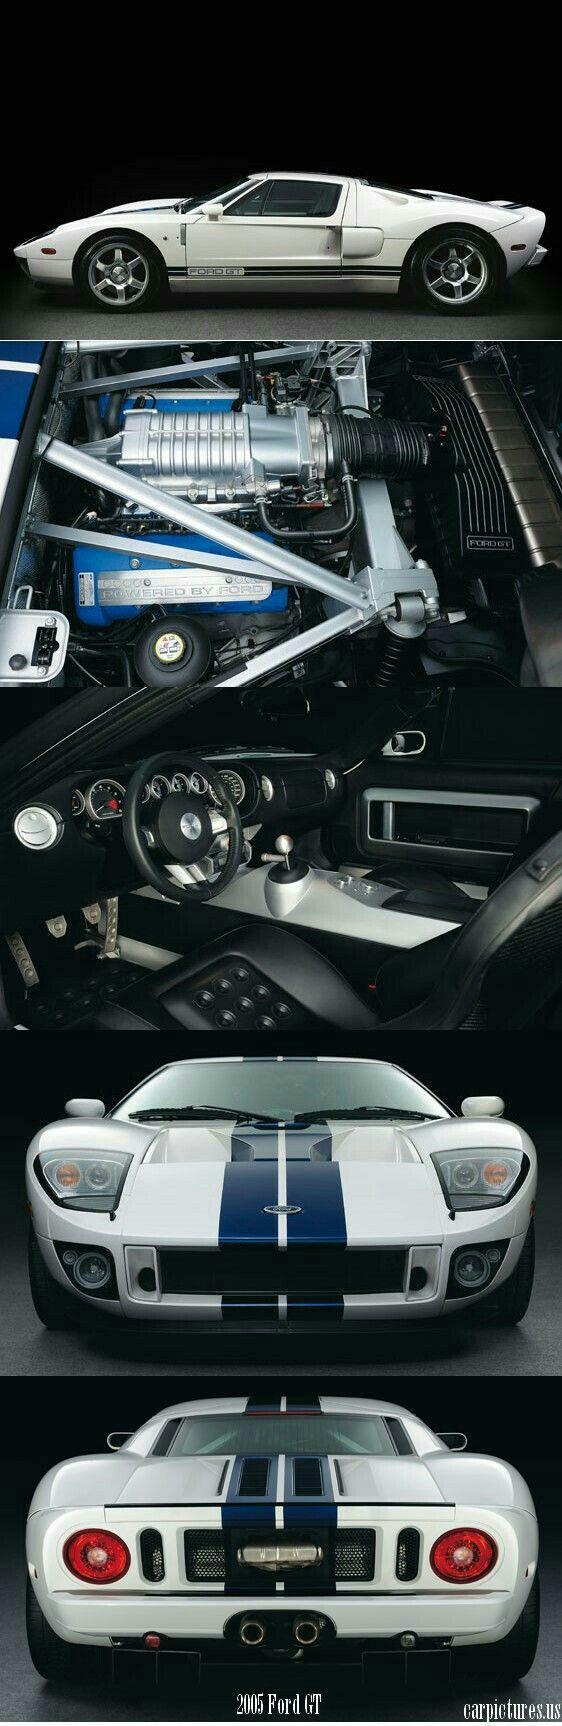 Ford GT holy cow batman!